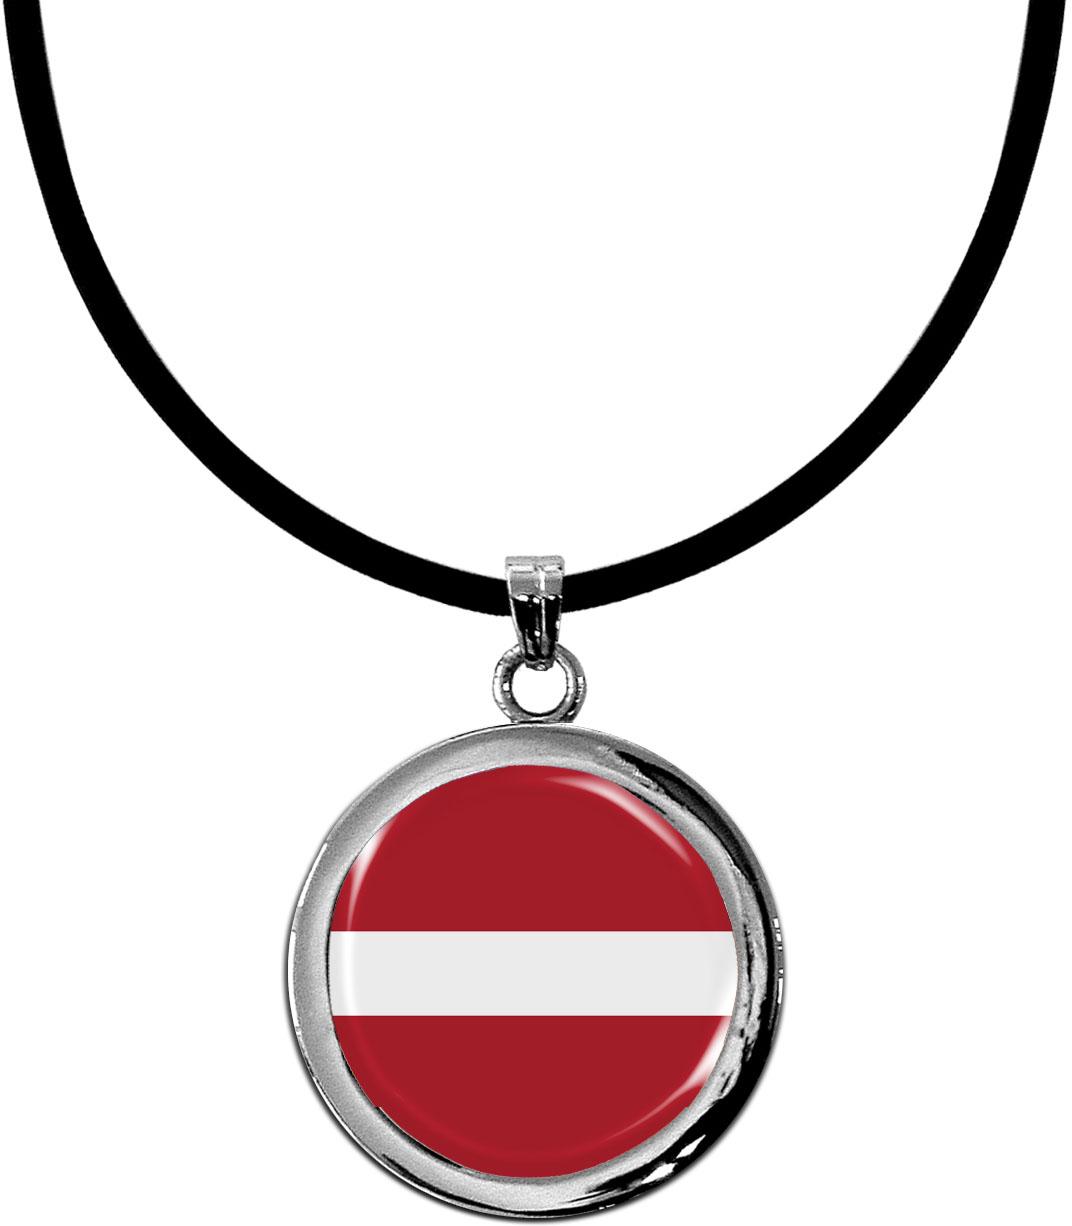 Kettenanhänger / Lettland / Silikonband mit Silberverschluss